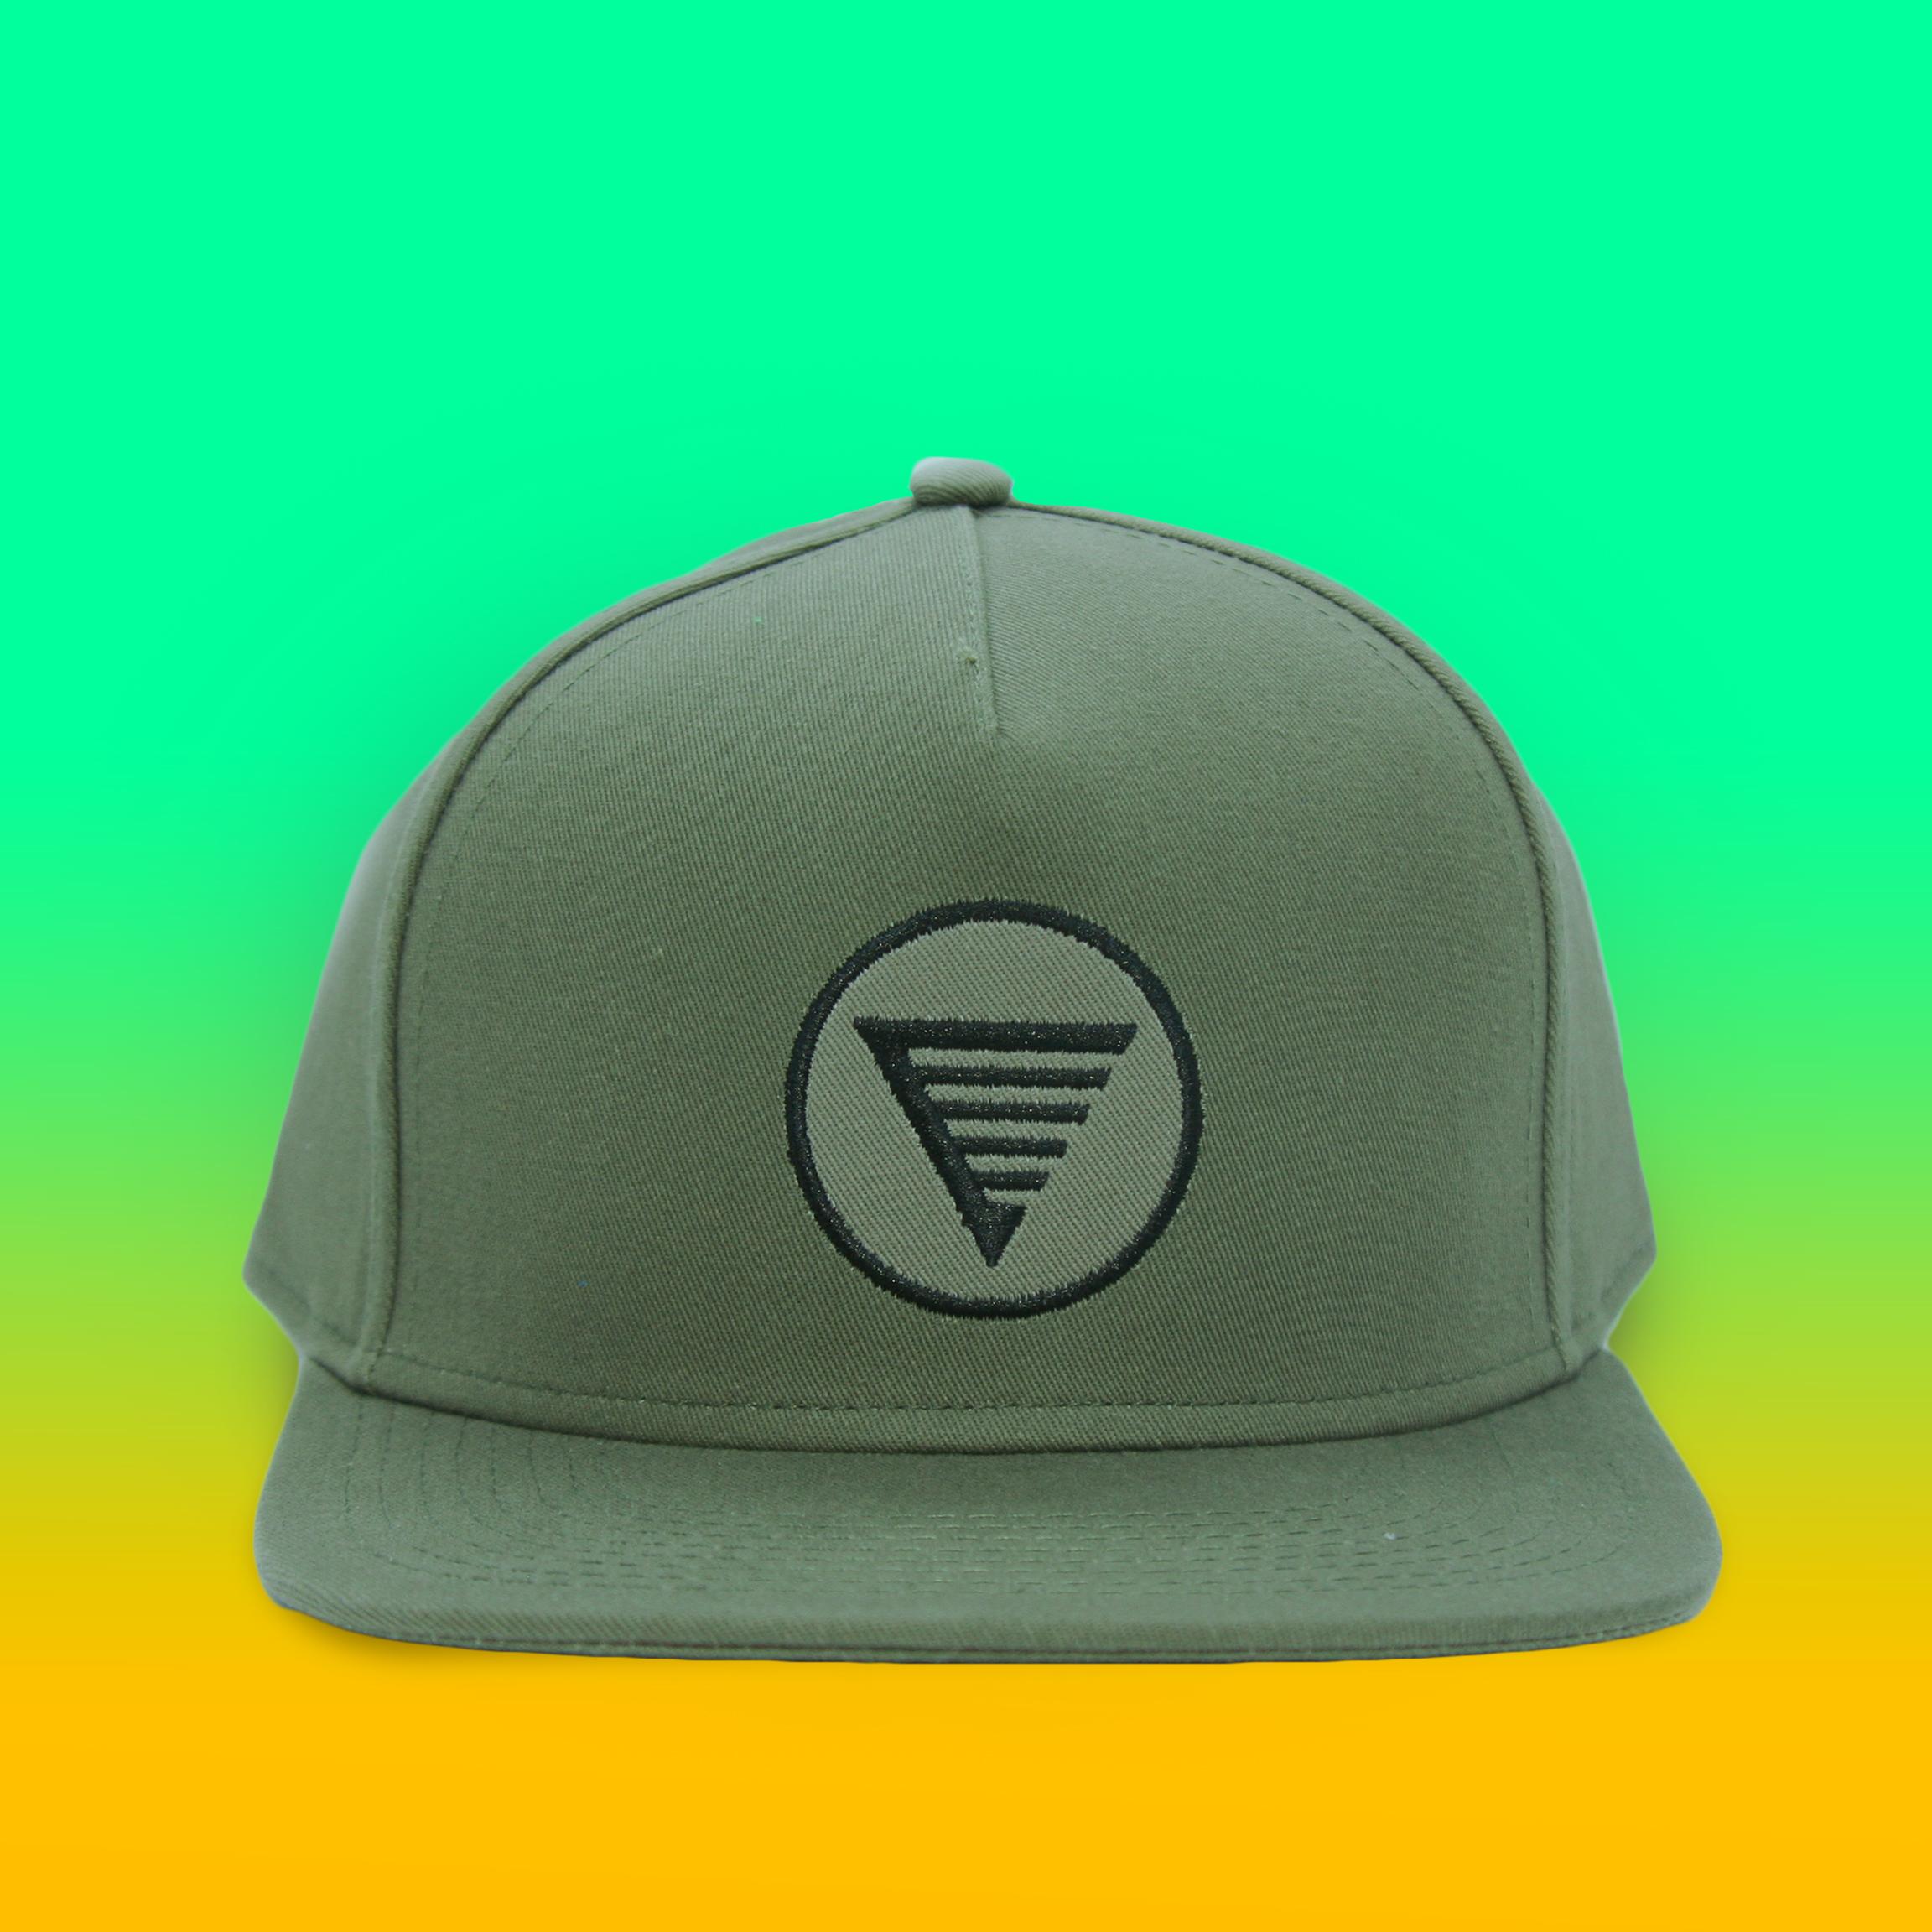 e82a90f7a3bd9 HOMES Trucker Hat- Olive Green. 0007 Ball army.jpg